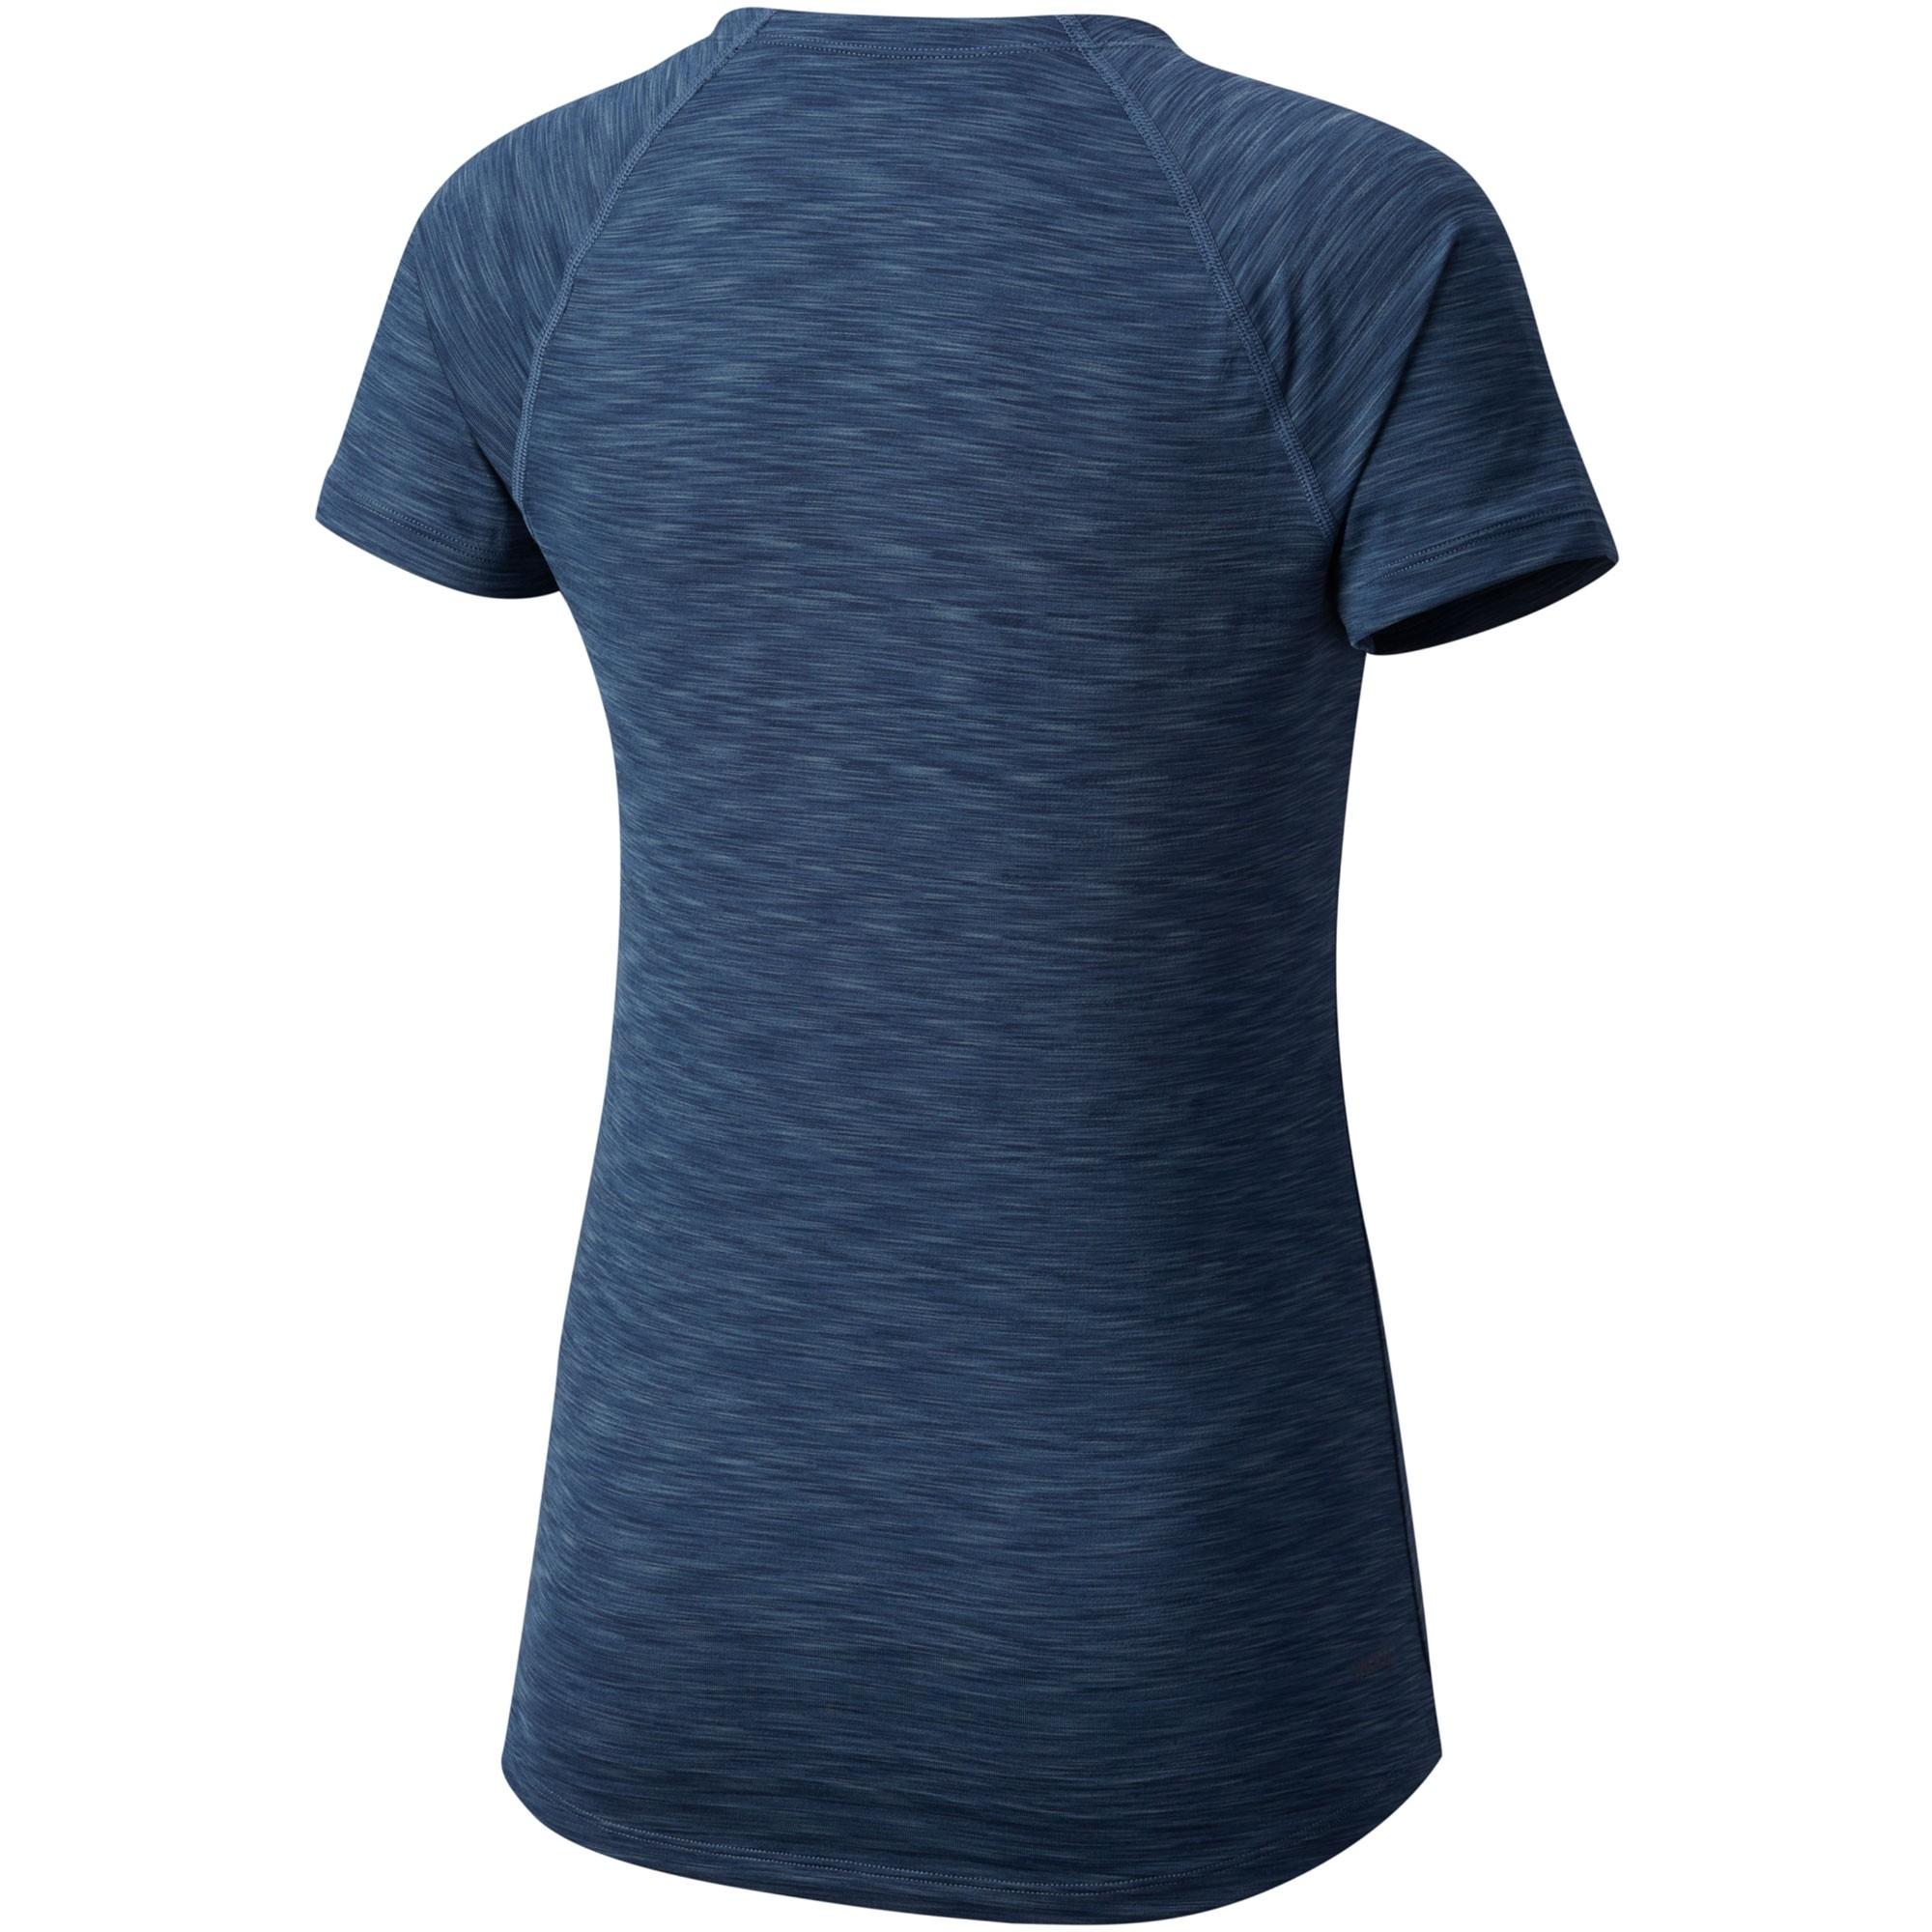 Mountain Hardwear Mighty Stripe Short Sleeve Tee - Zinc